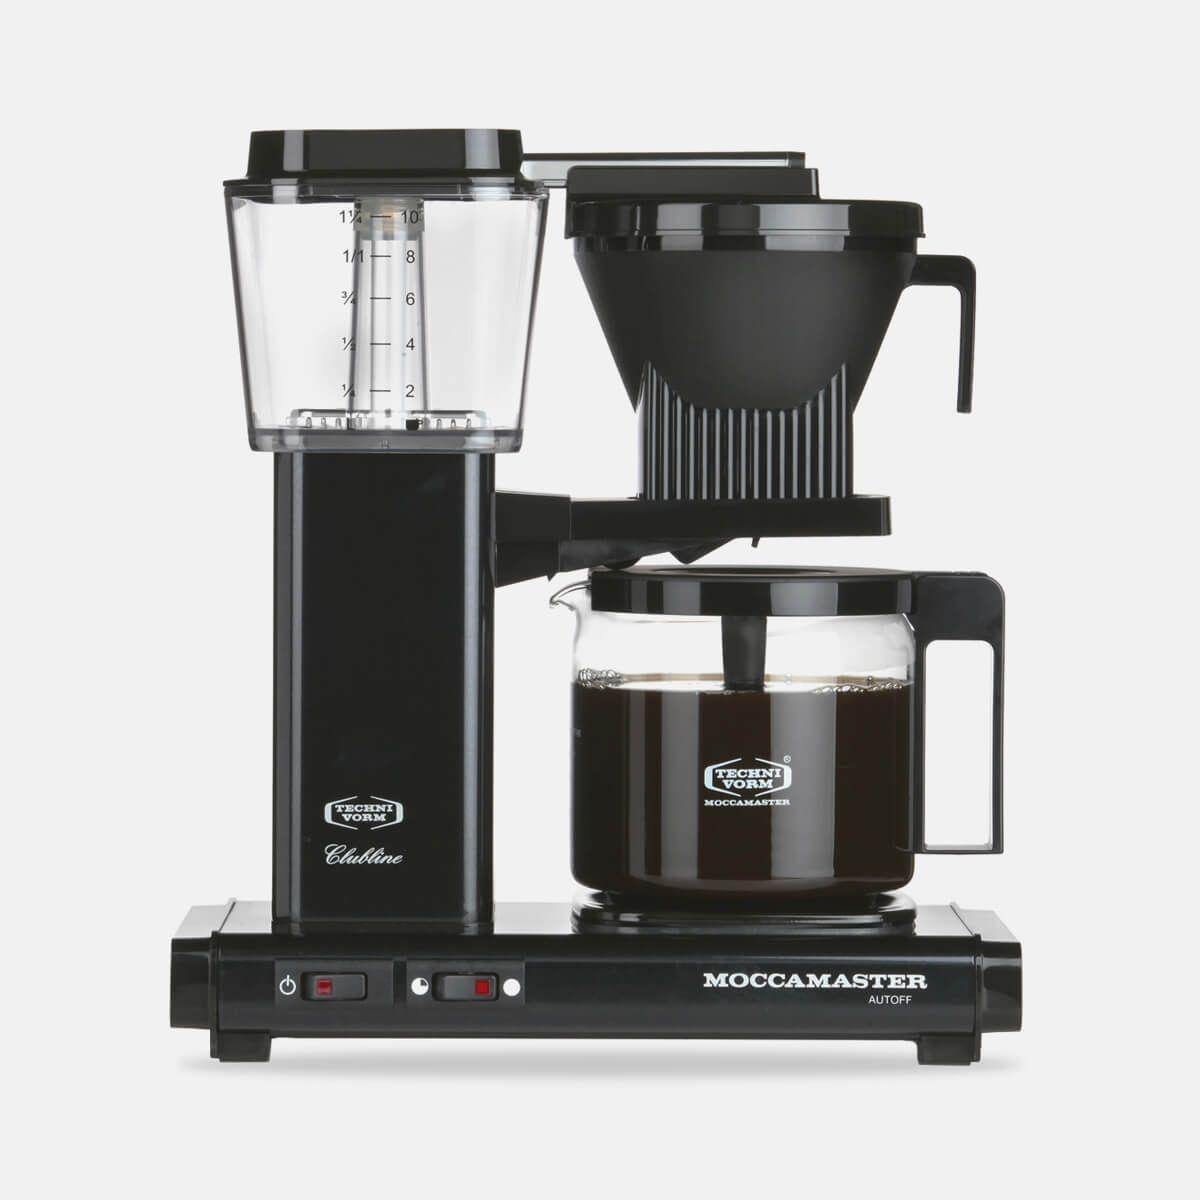 Moccamaster Van Dyck Kaffee Online Shop Online kaufen